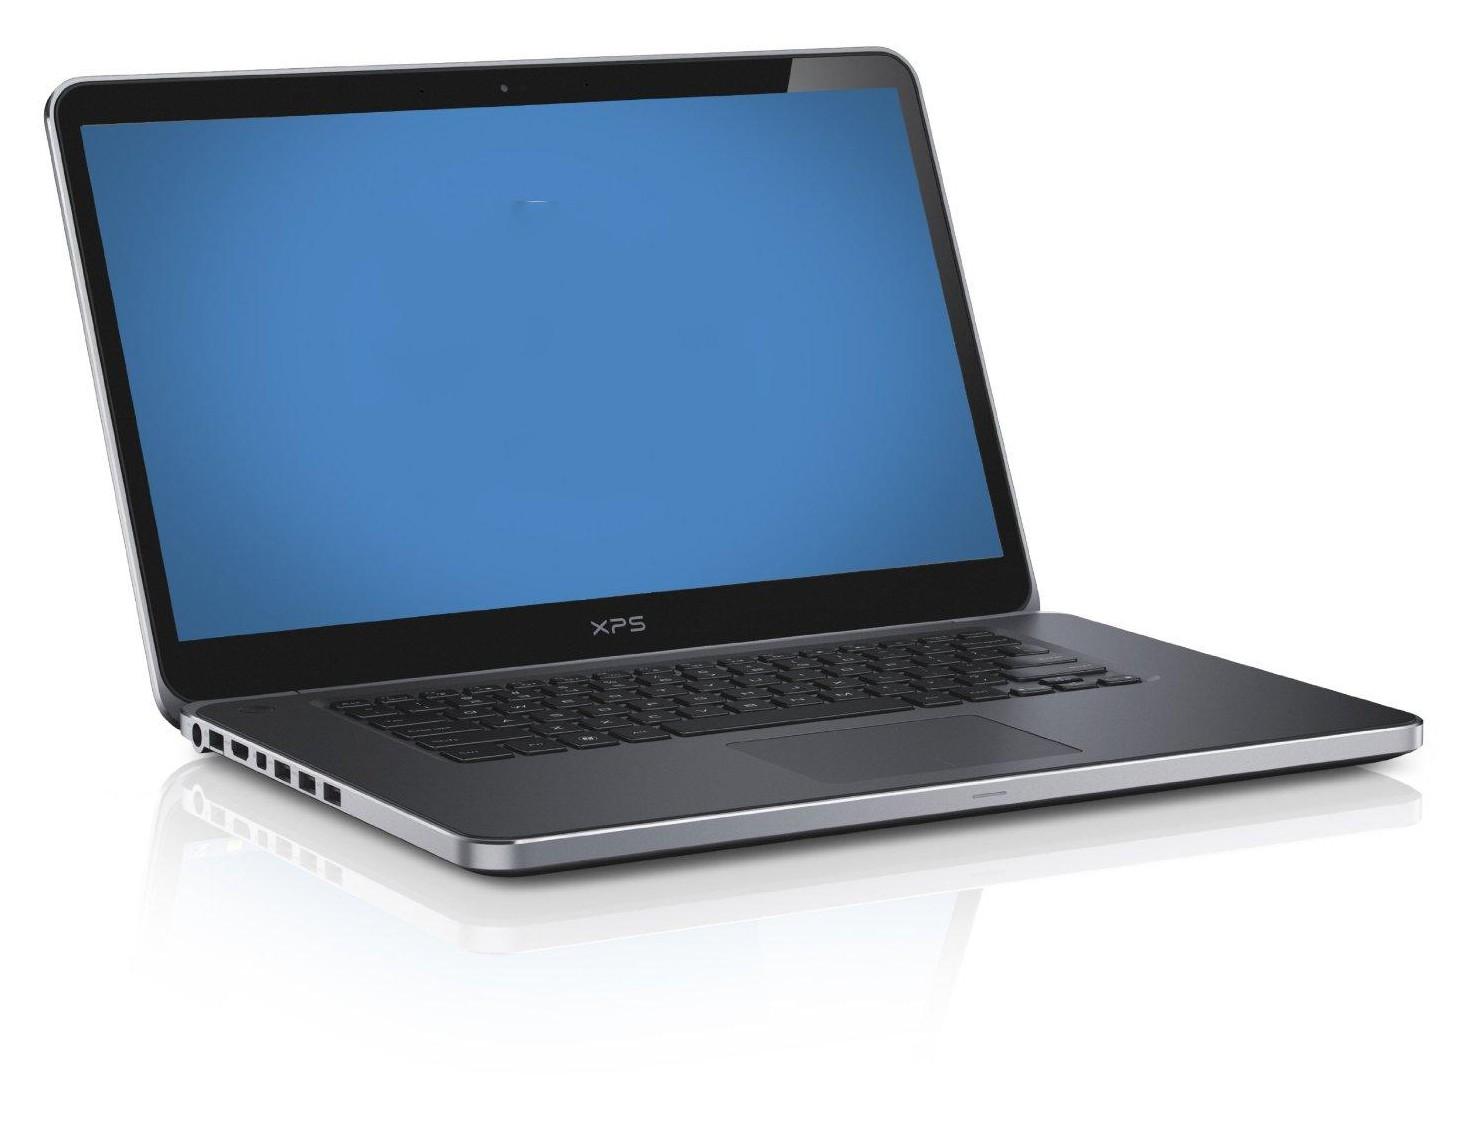 XPS-XPS15-9062slv-15-Inch-Laptop